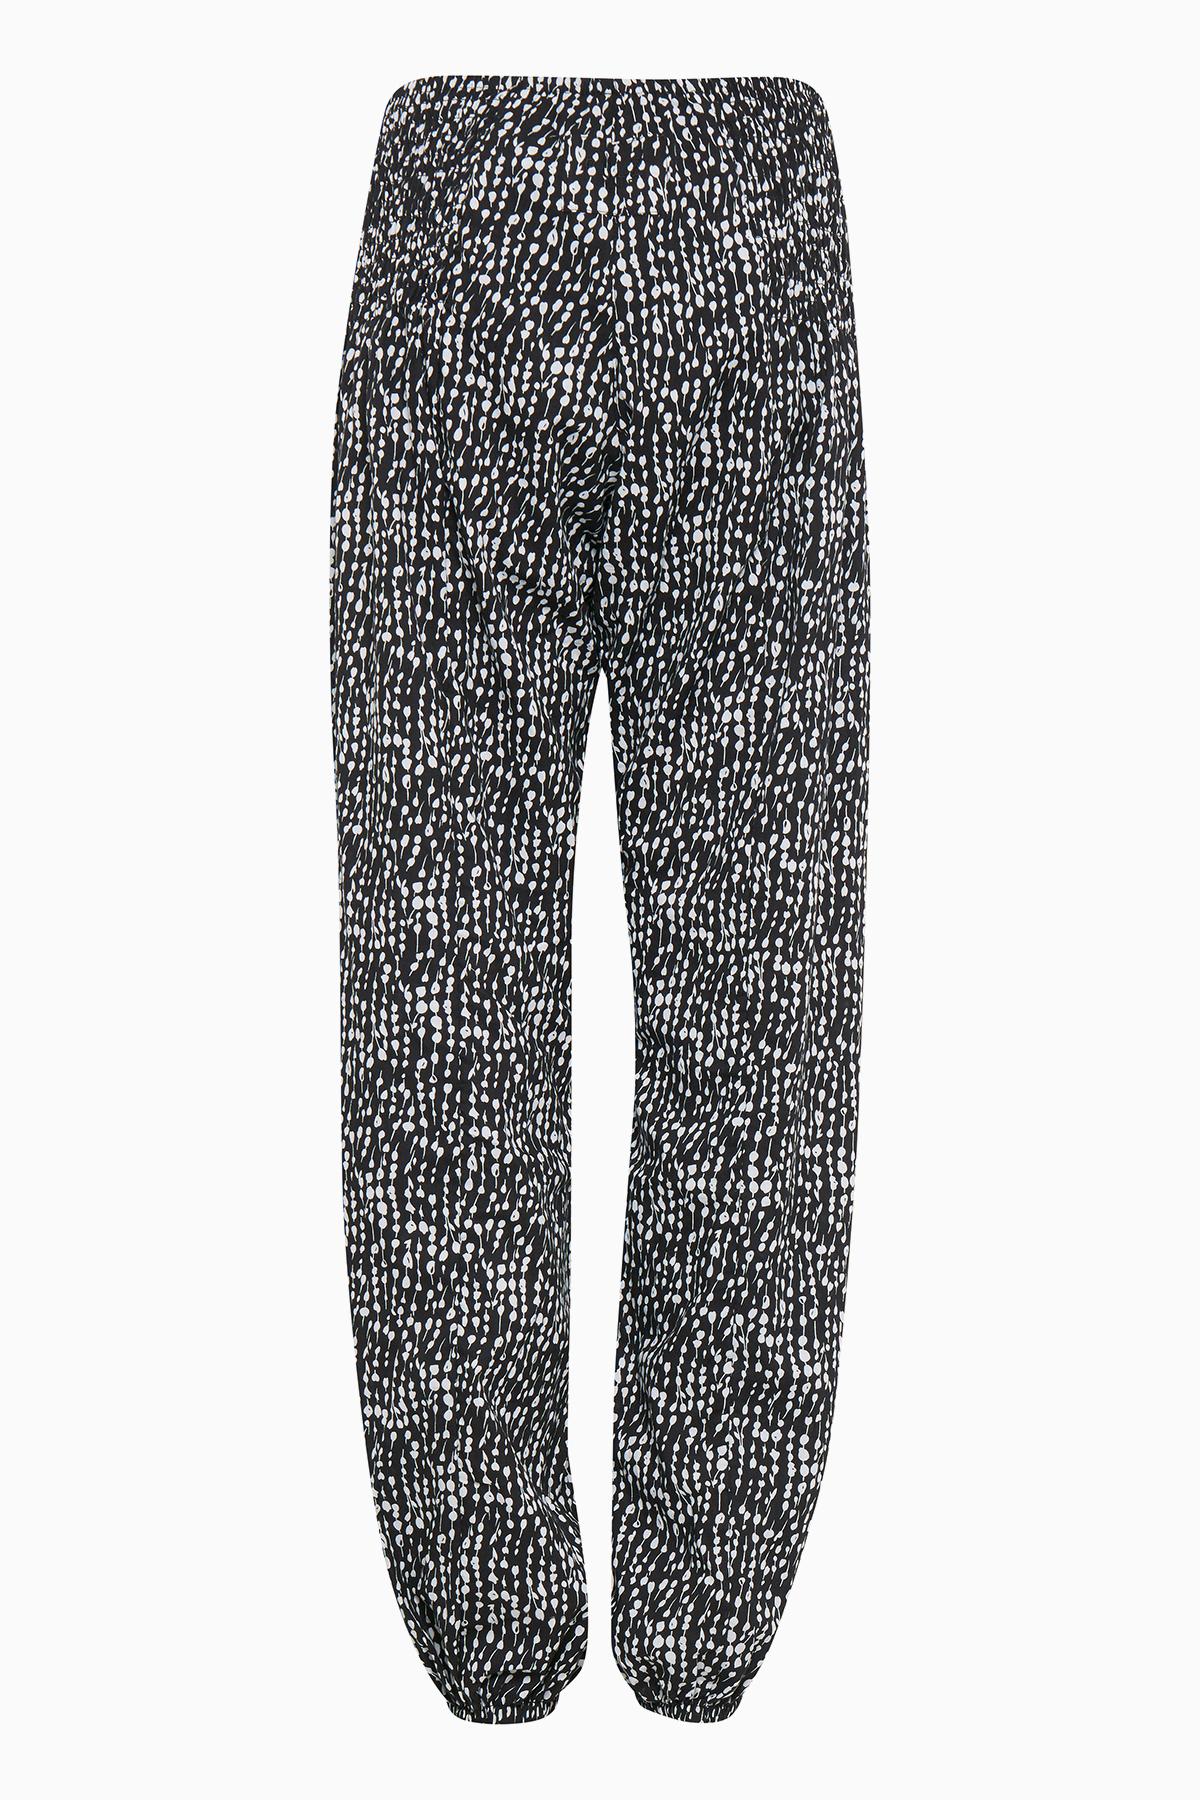 Black/Star White Pants Suiting – Køb Black/Star White Pants Suiting fra str. XS-XXL her